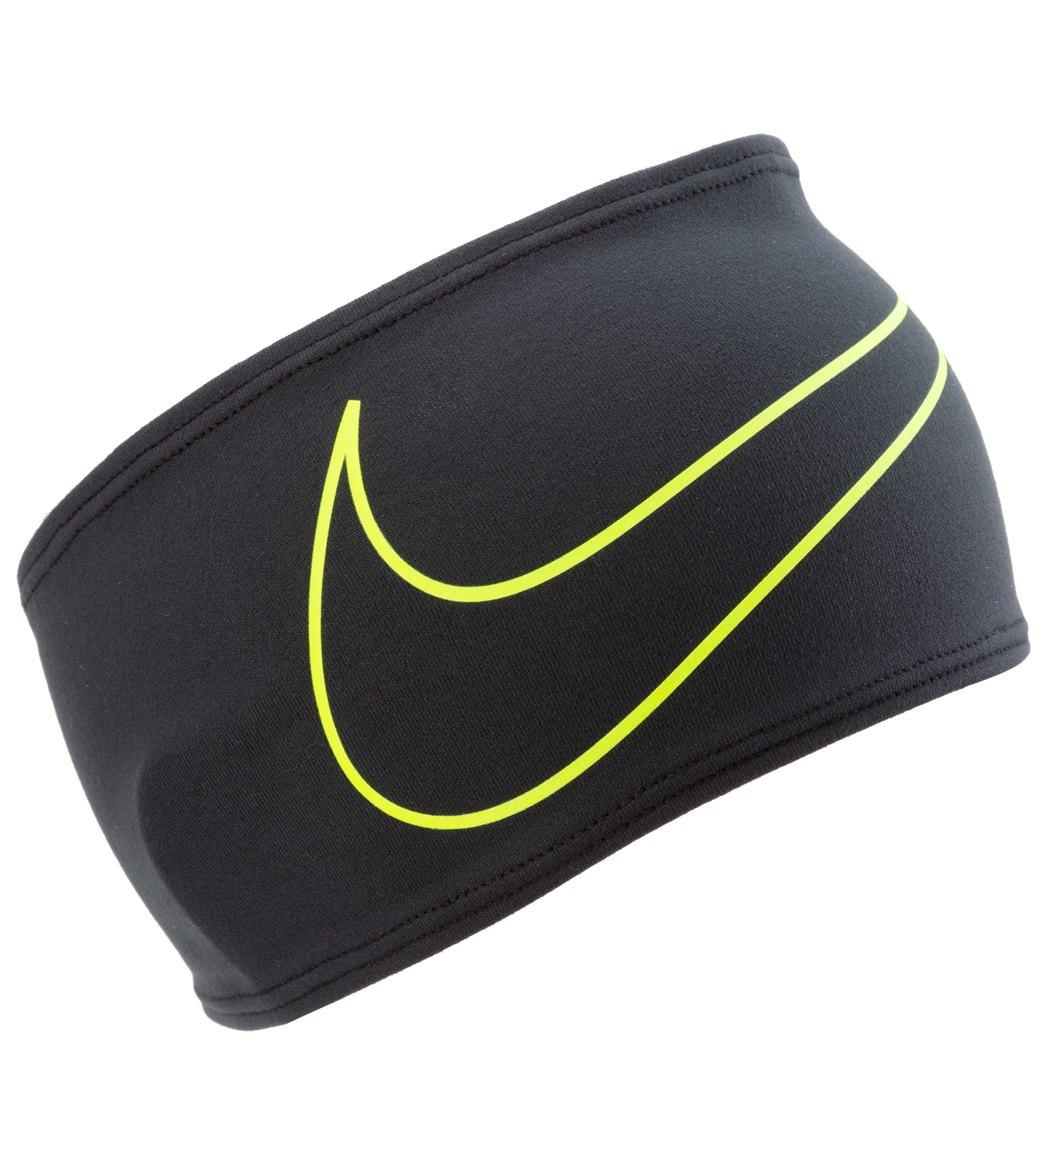 ... Nike Dri-Fit Swoosh Running Headband at YogaOutlet.com uk availability  71703 bd239 ... df1b0ad87a5